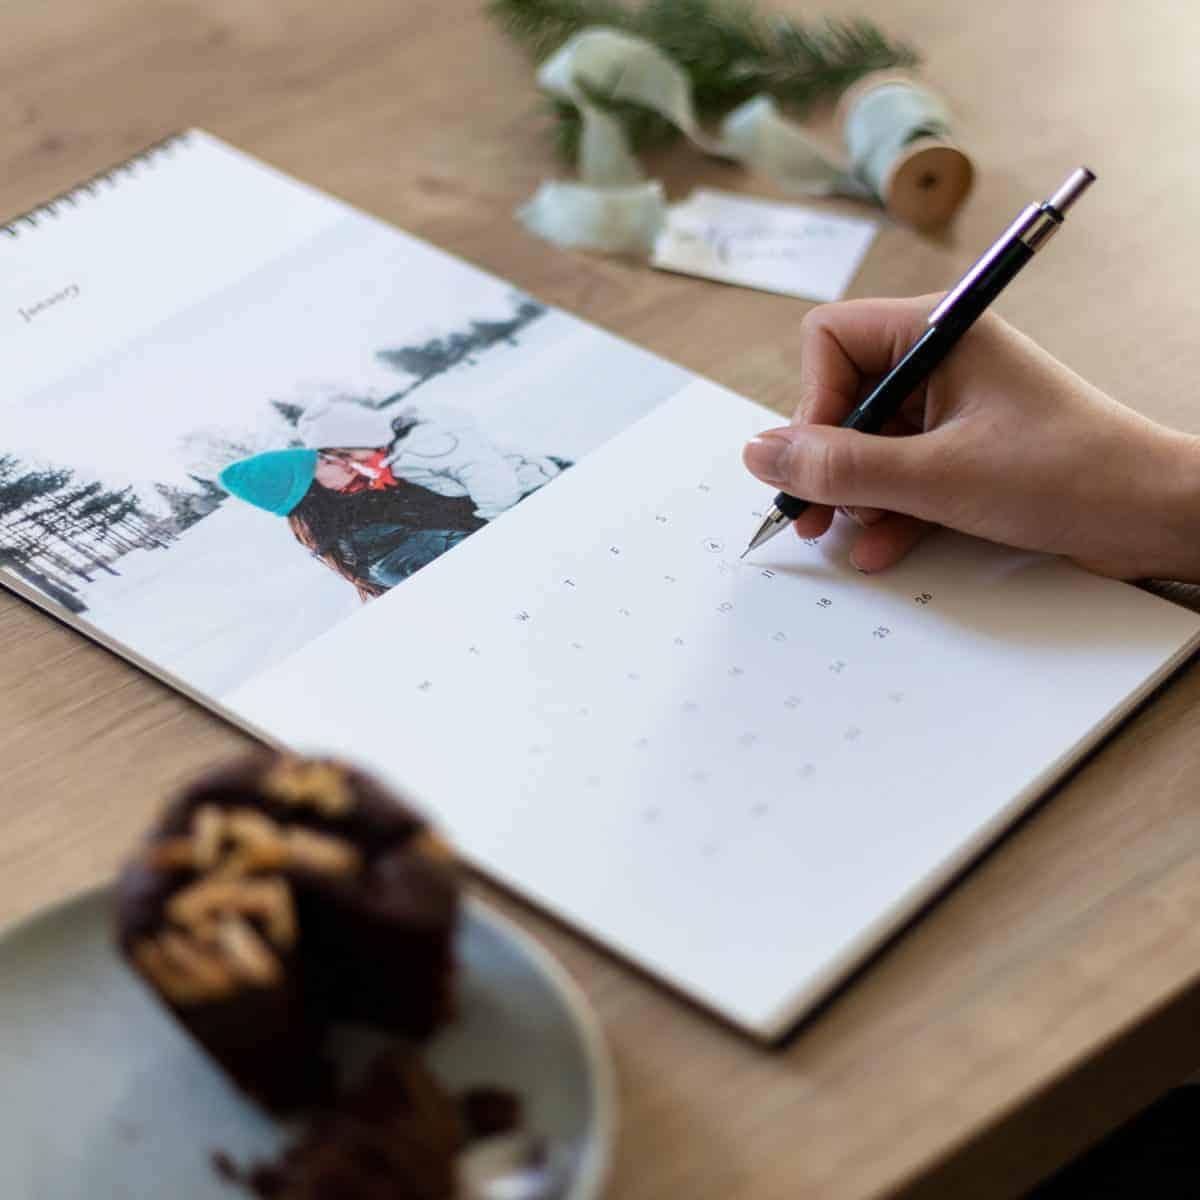 personalised photo calendar from Rosemood